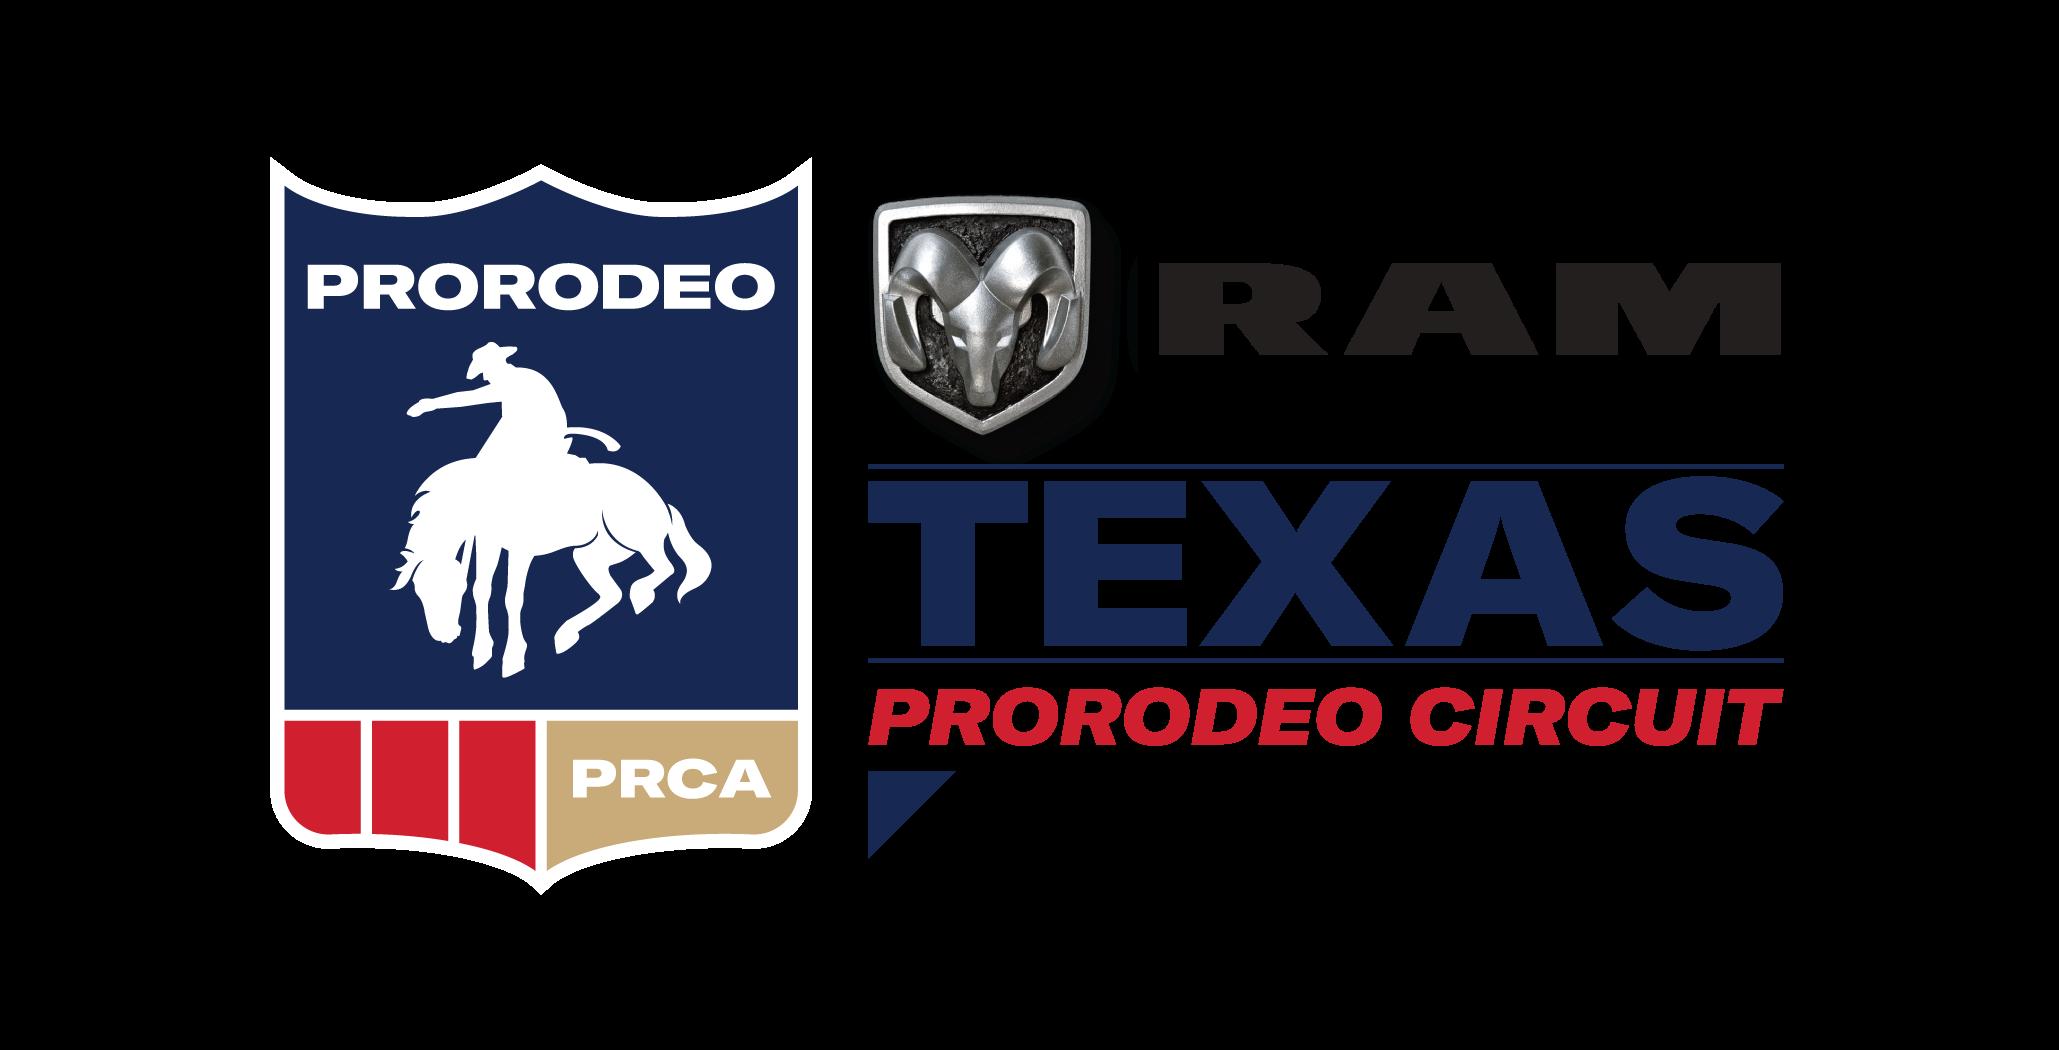 PRCA_CIRCUIT_Texas.png